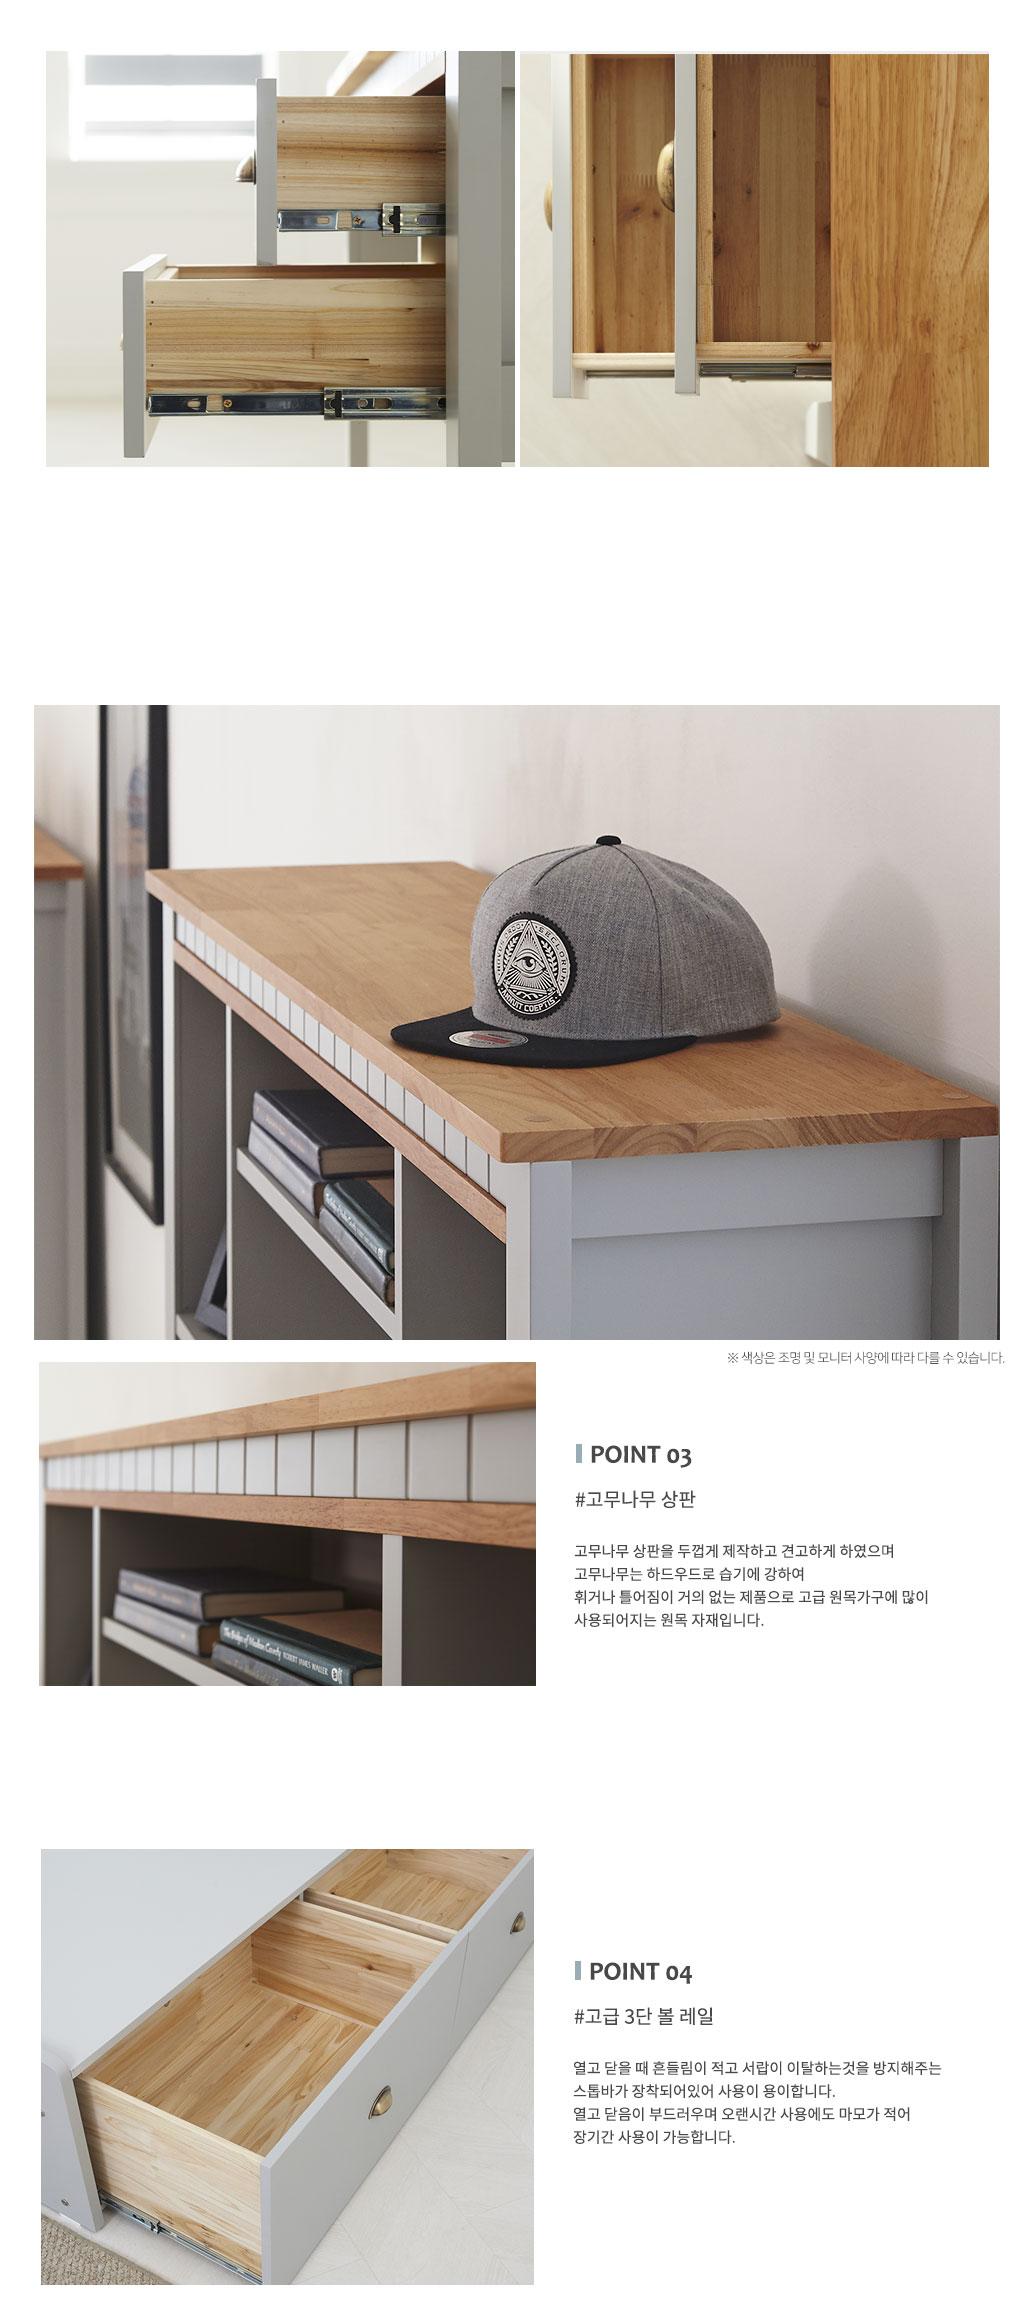 raffiel_desk_05.jpg